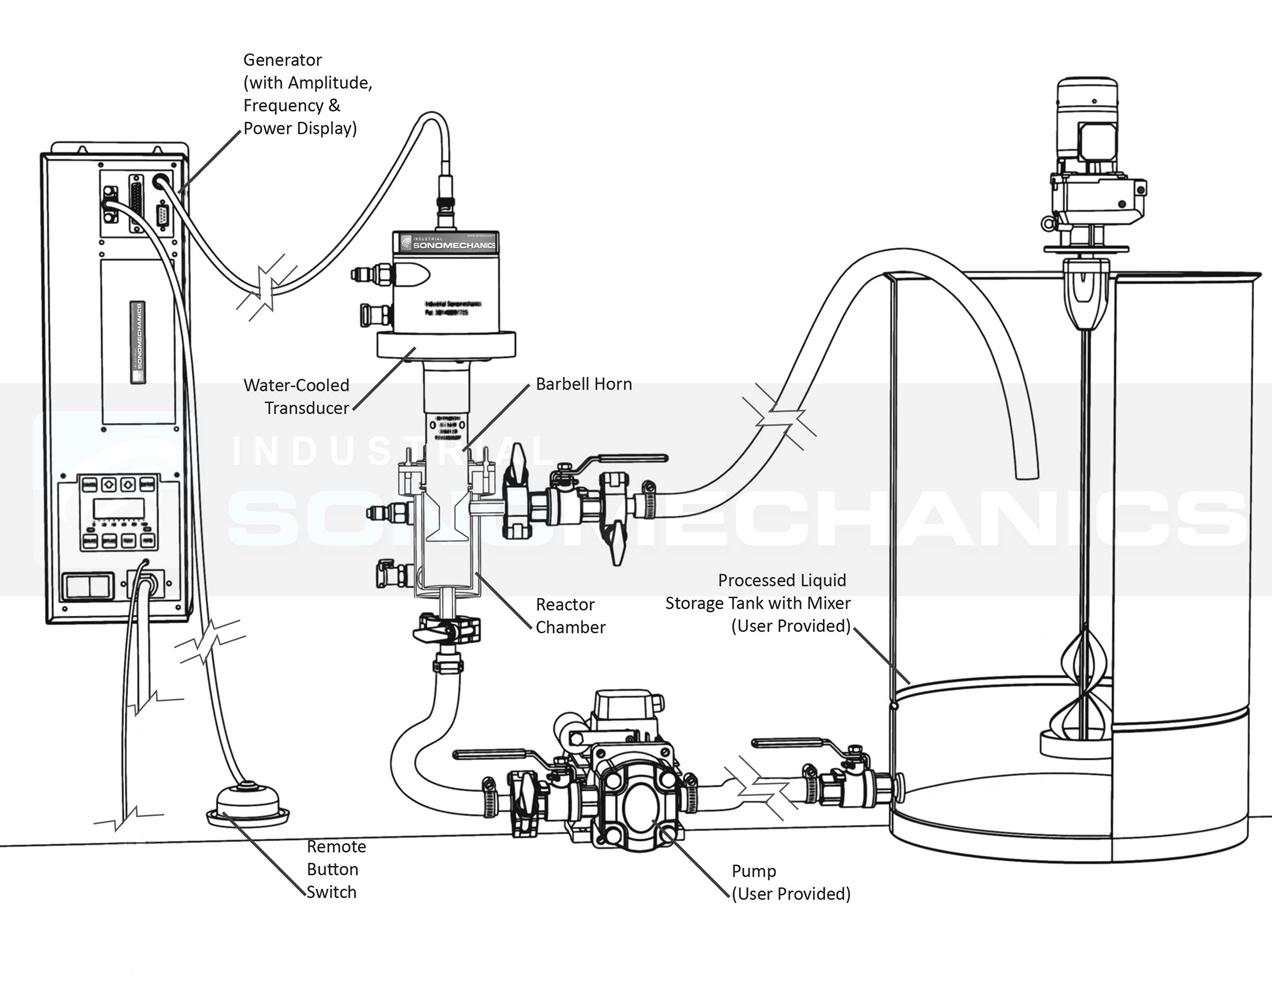 Recirculating mode schematic BSP-1200 Ultrasonic System